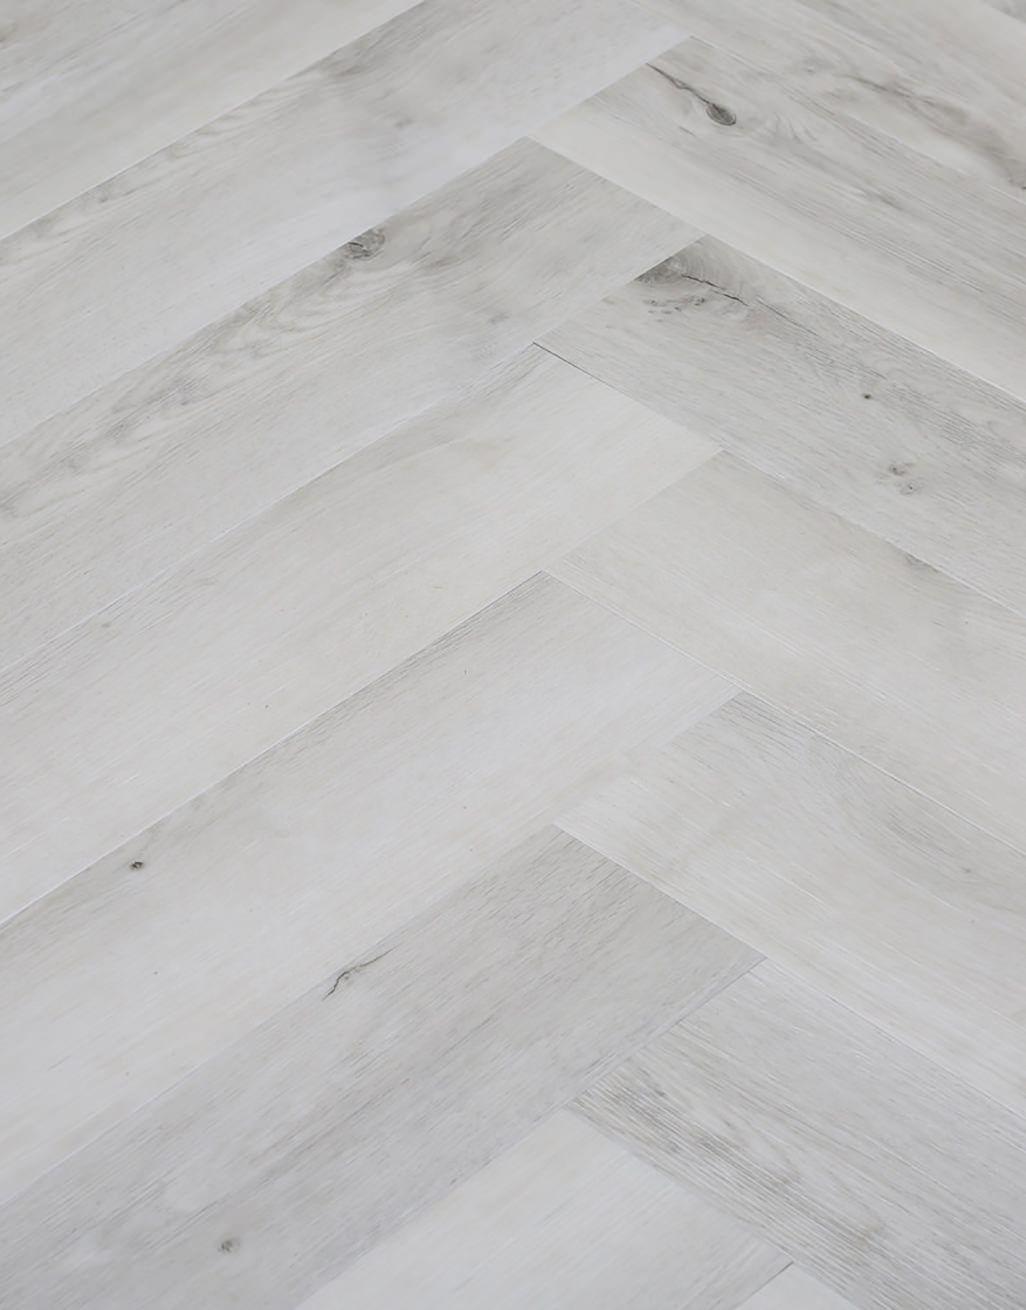 White Rustic Oak Lvt Flooring, White Herringbone Laminate Flooring